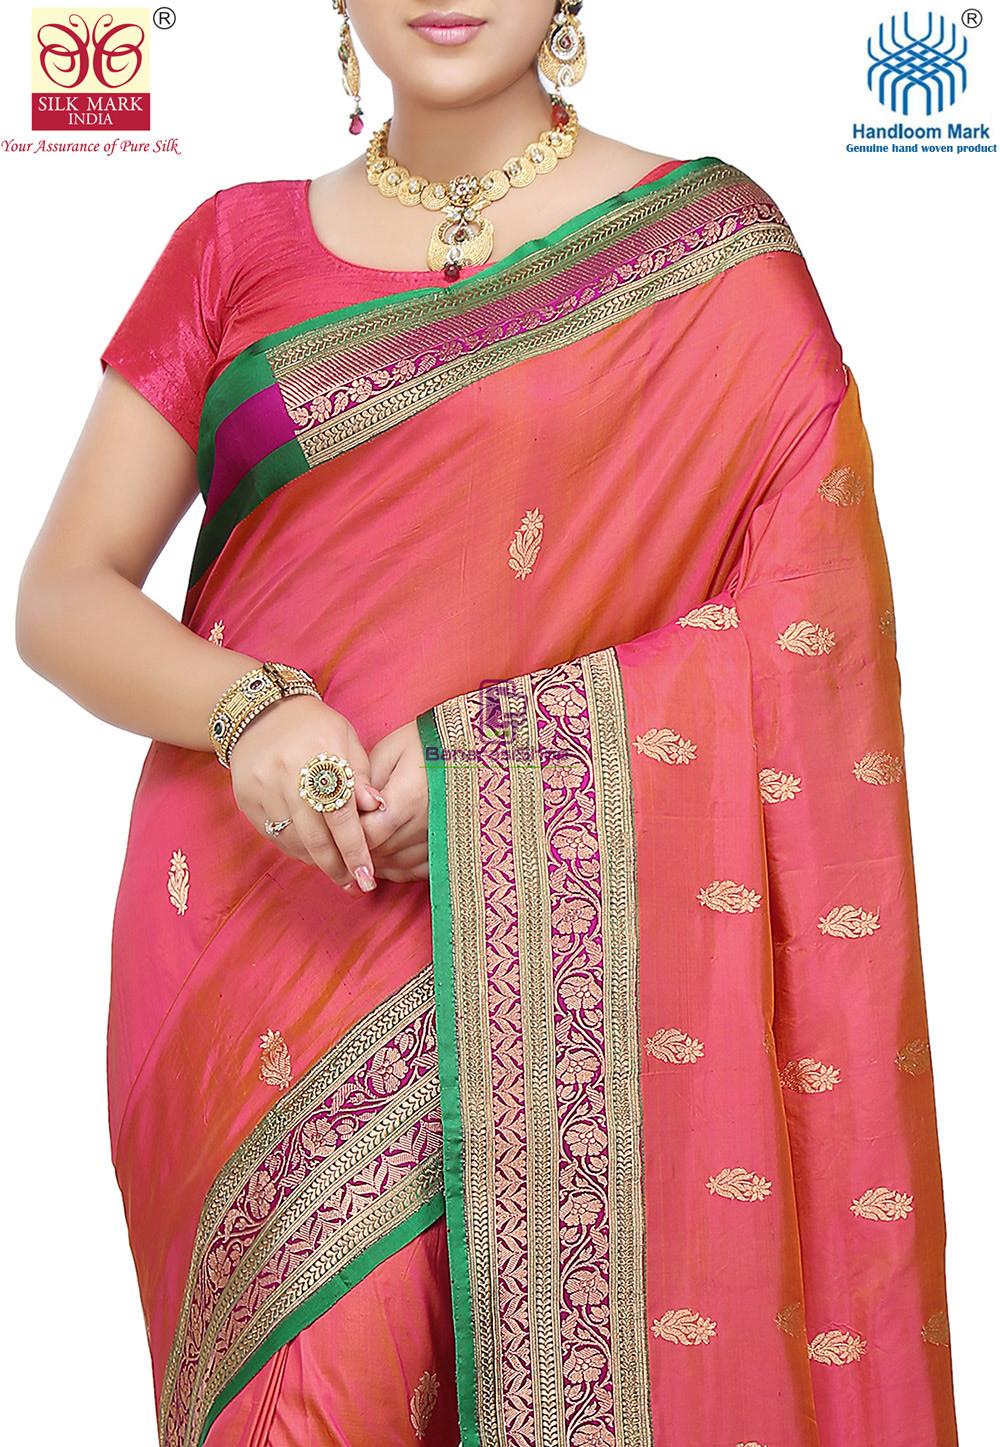 Banarasi Pure Katan Silk Handloom Saree in Coral Pink 2